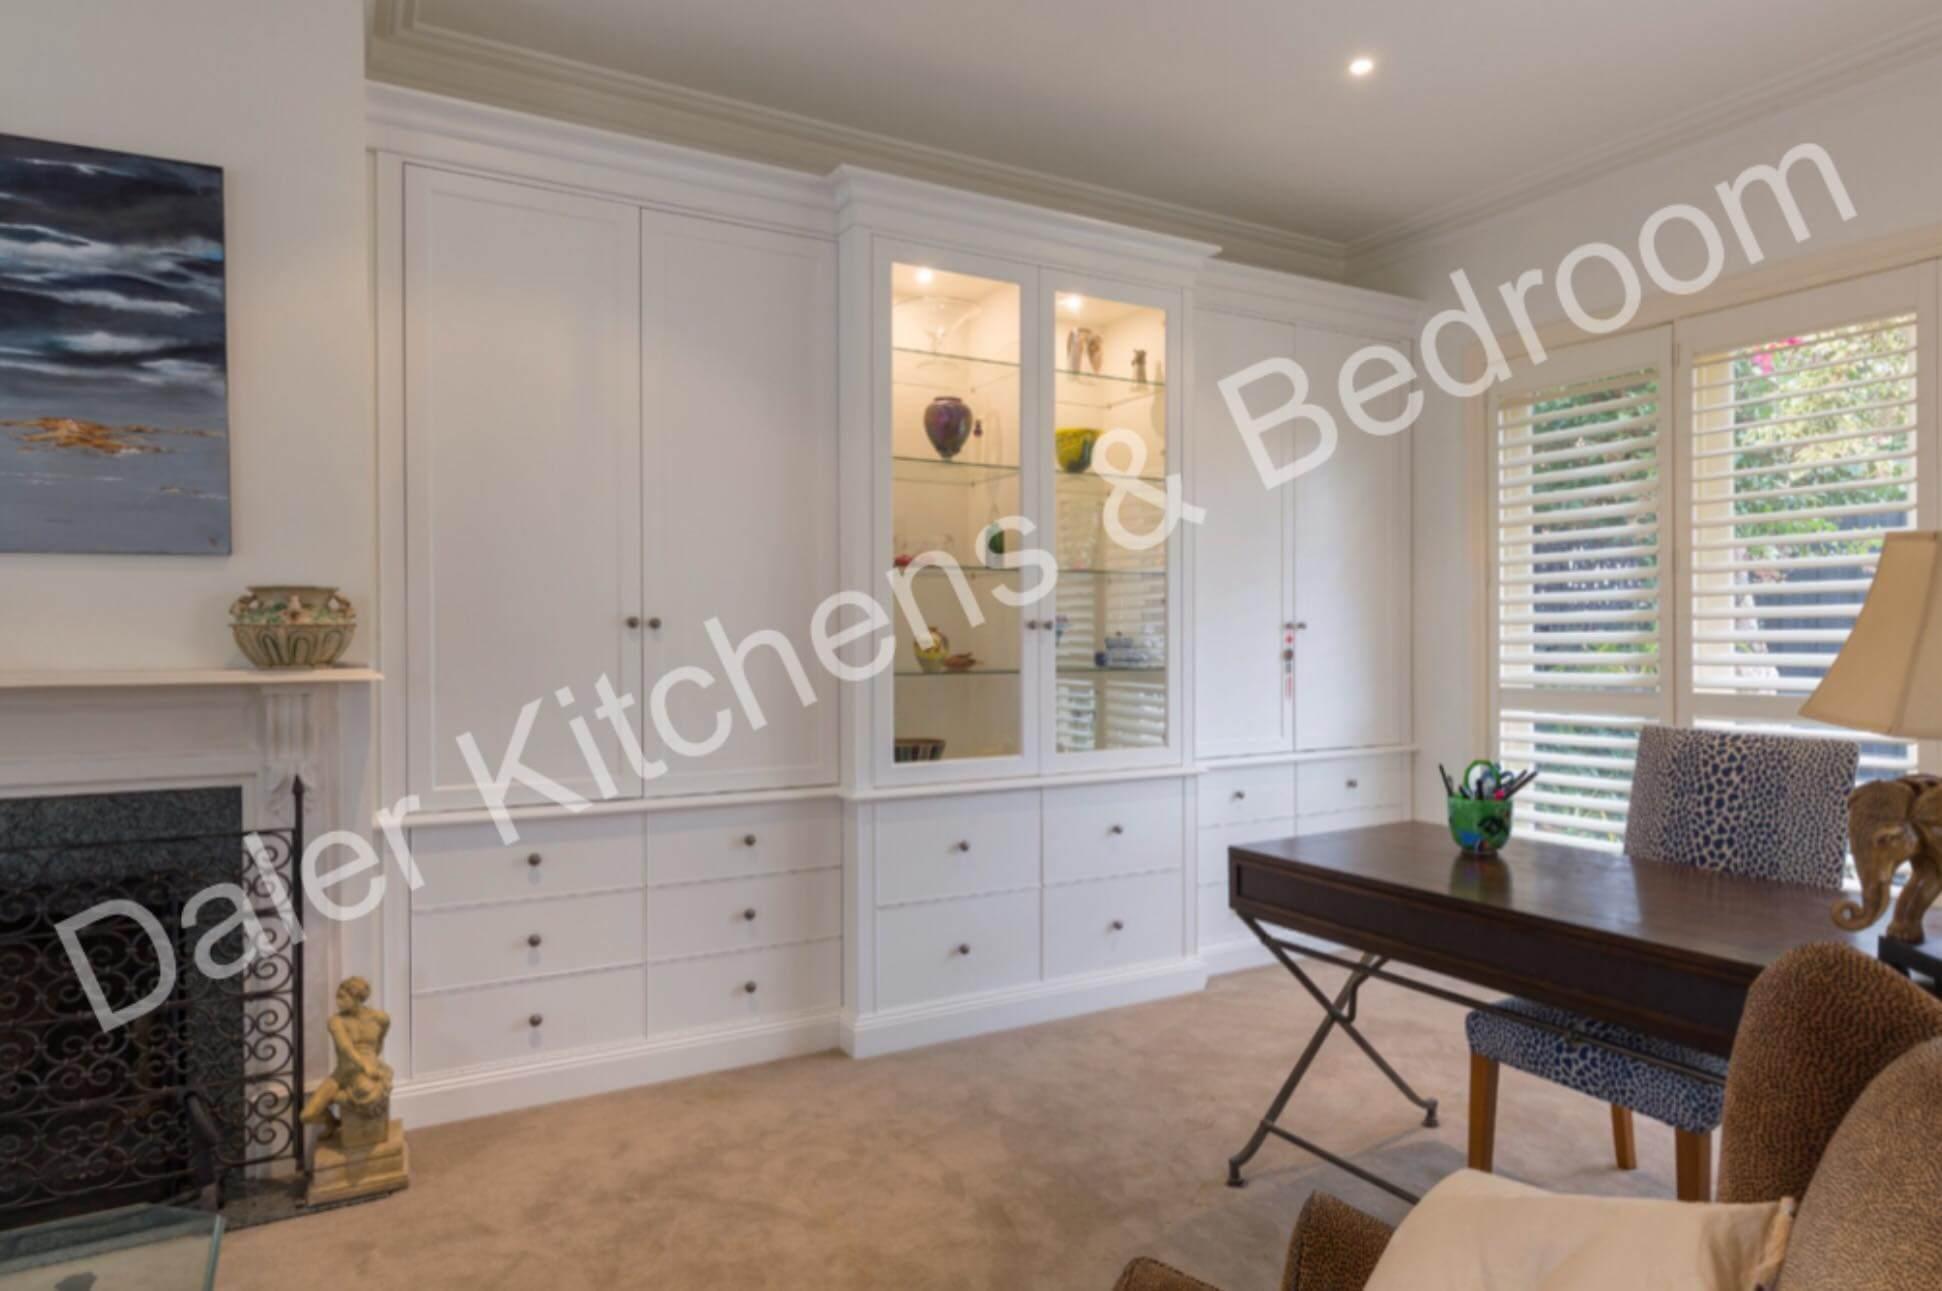 Living Room Bespoke Furniture Cost London